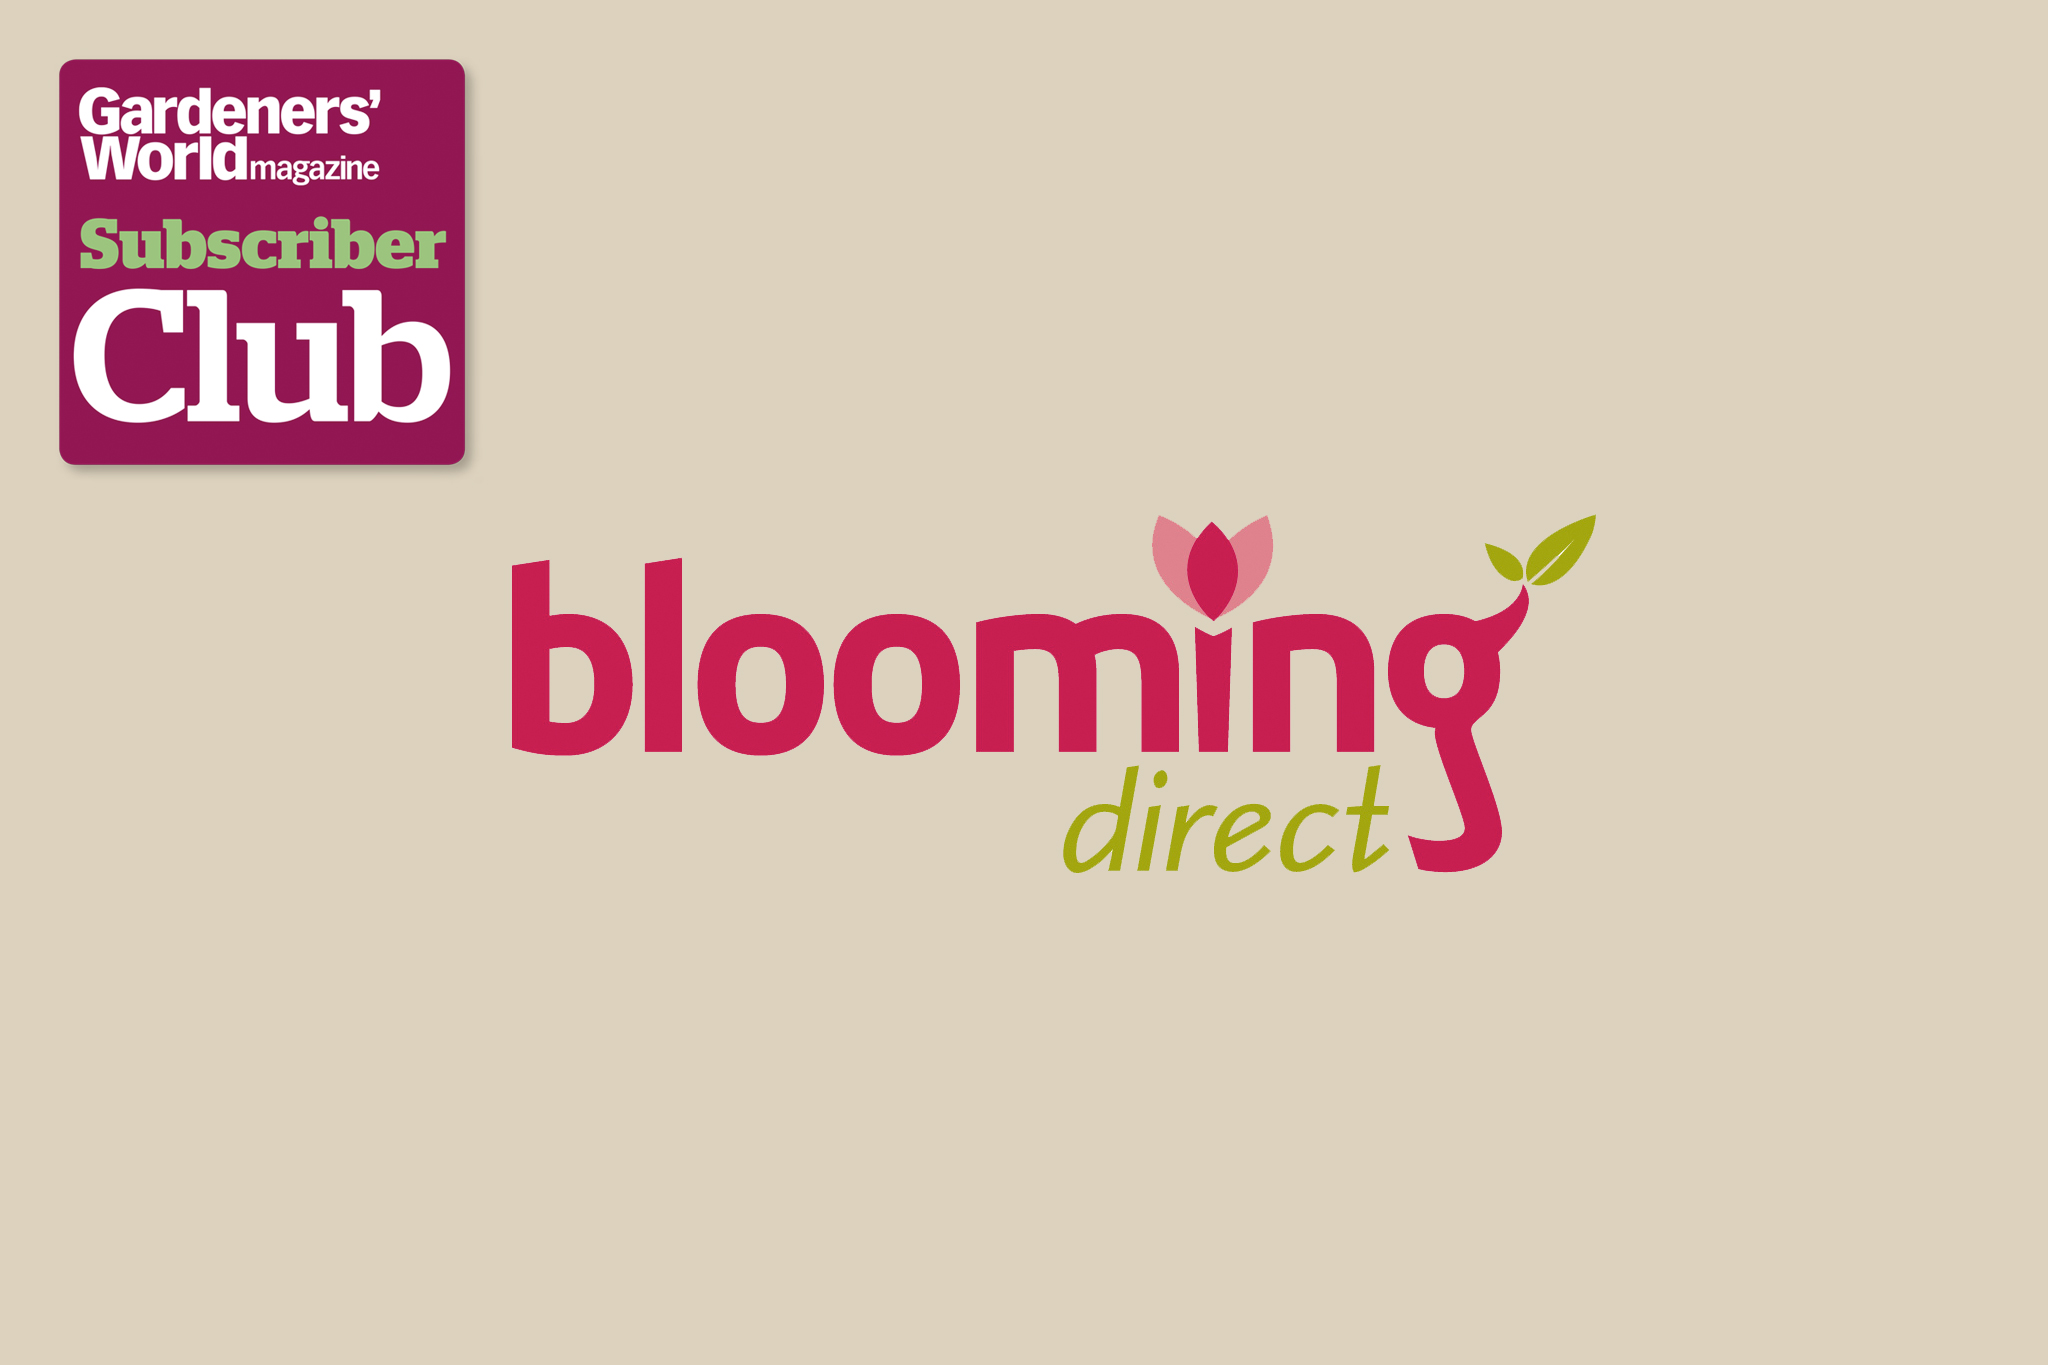 Blooming Direct BBC Gardeners' World Magazine Subscriber Club discount